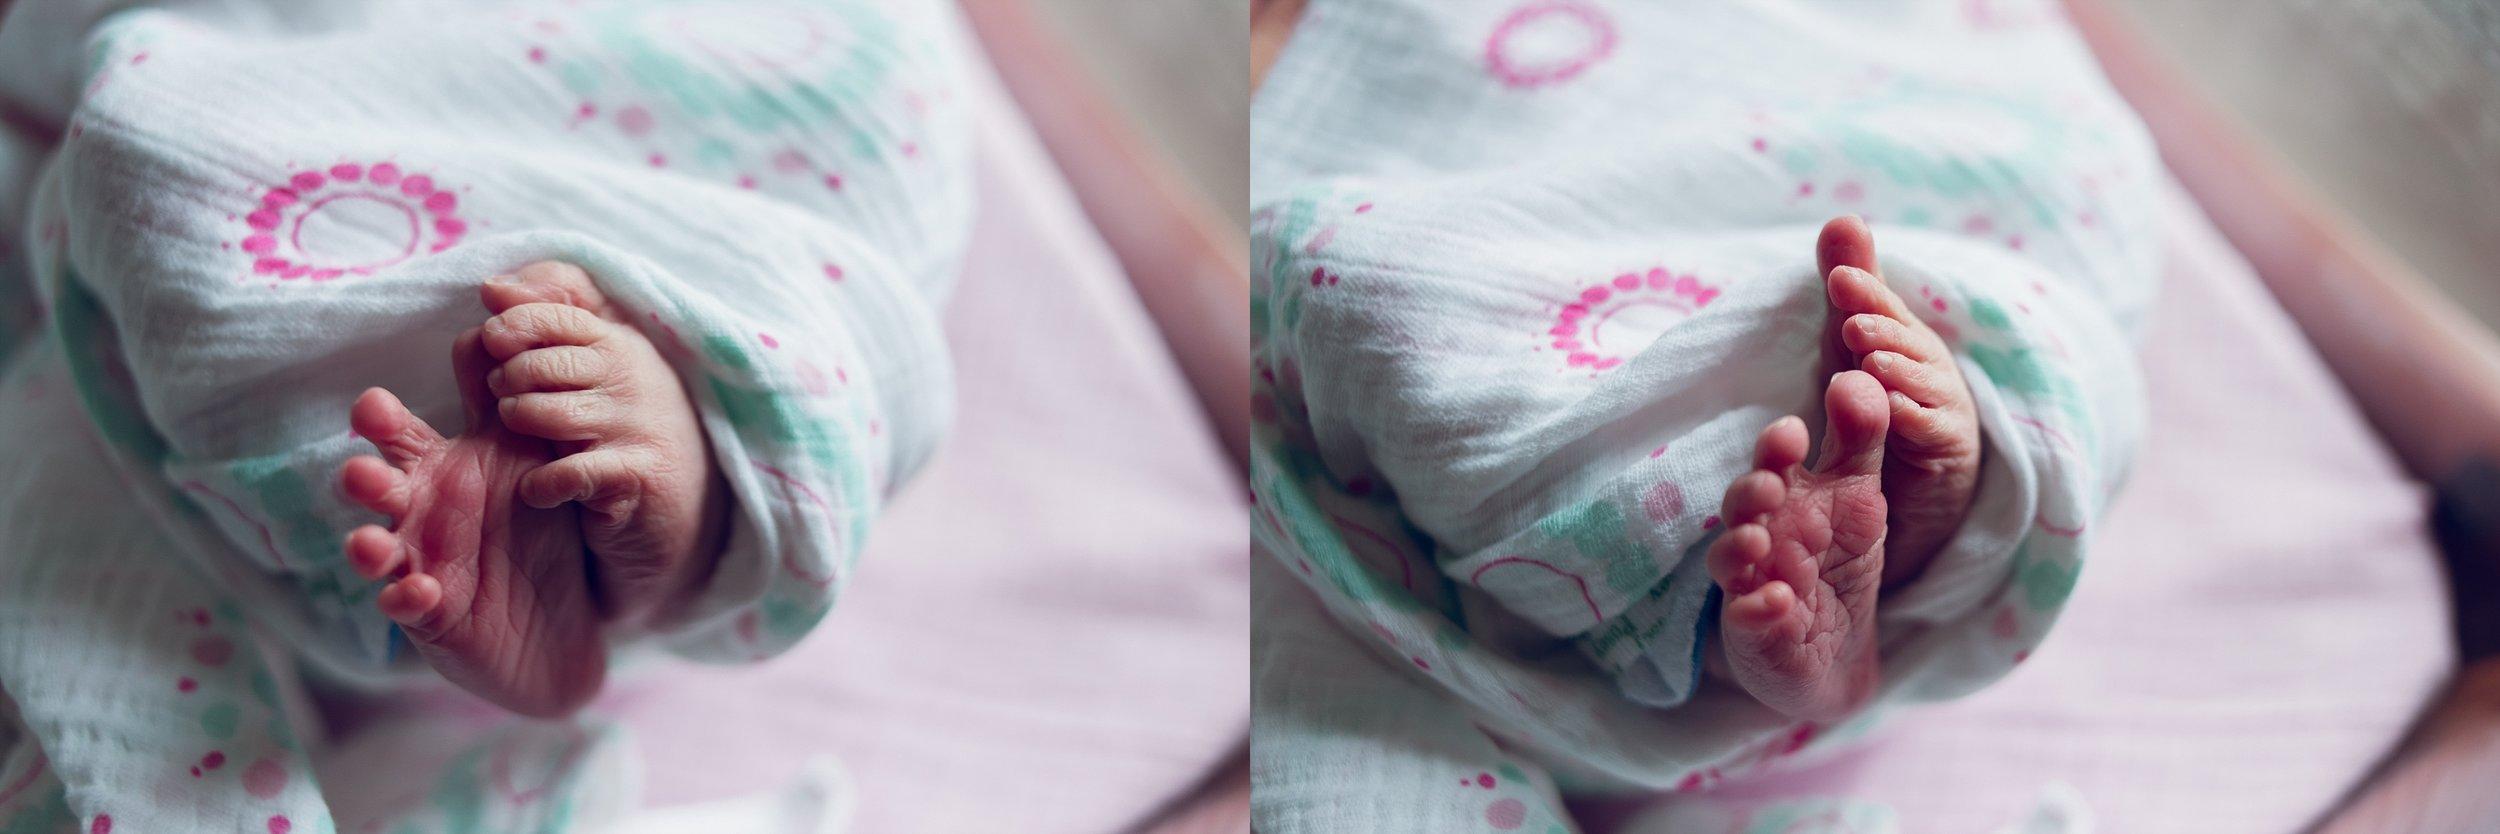 BrittneyHogue-Fresh48-NewbornPhotographer-PeoriaIL-PekinIL (3).jpg